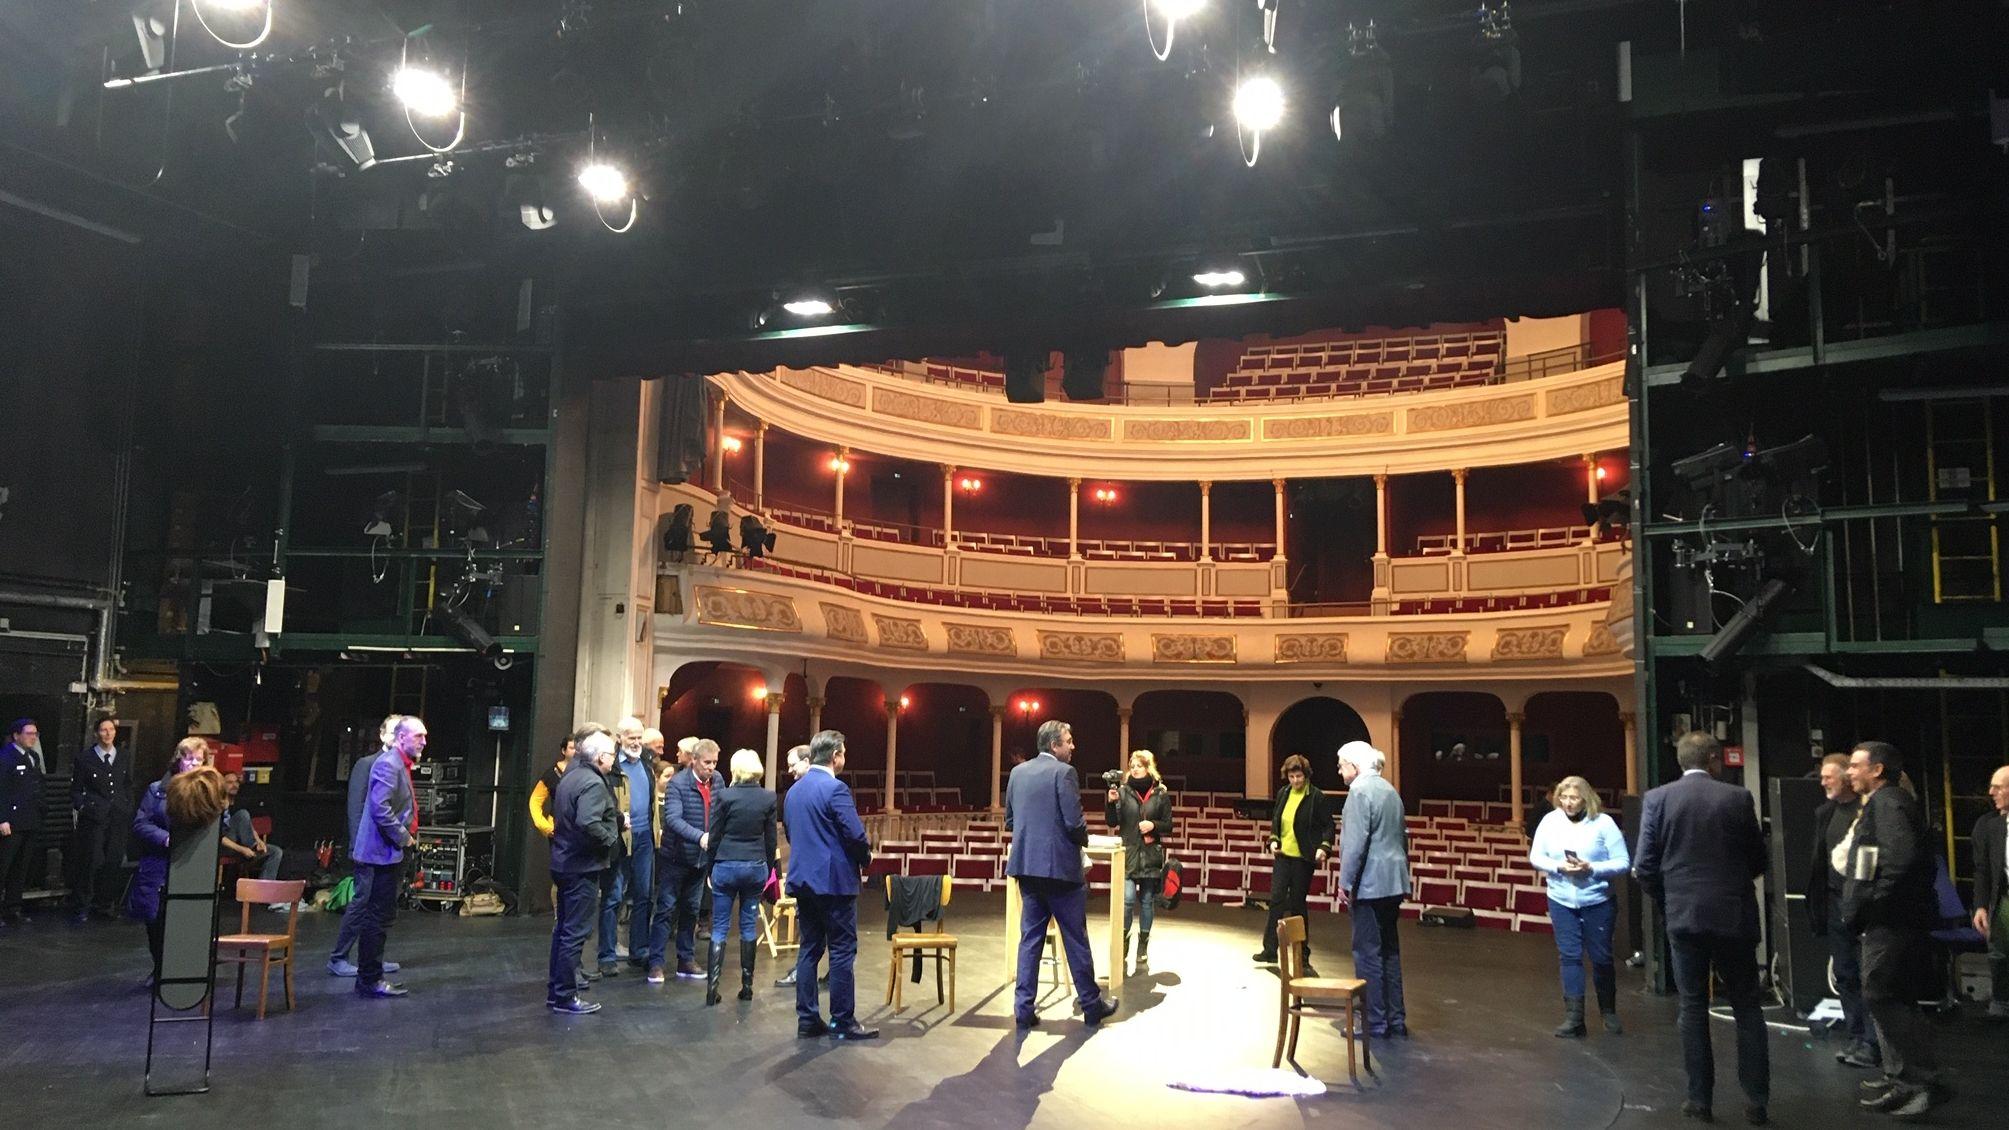 Bühne des Aschaffenburger Stadttheaters